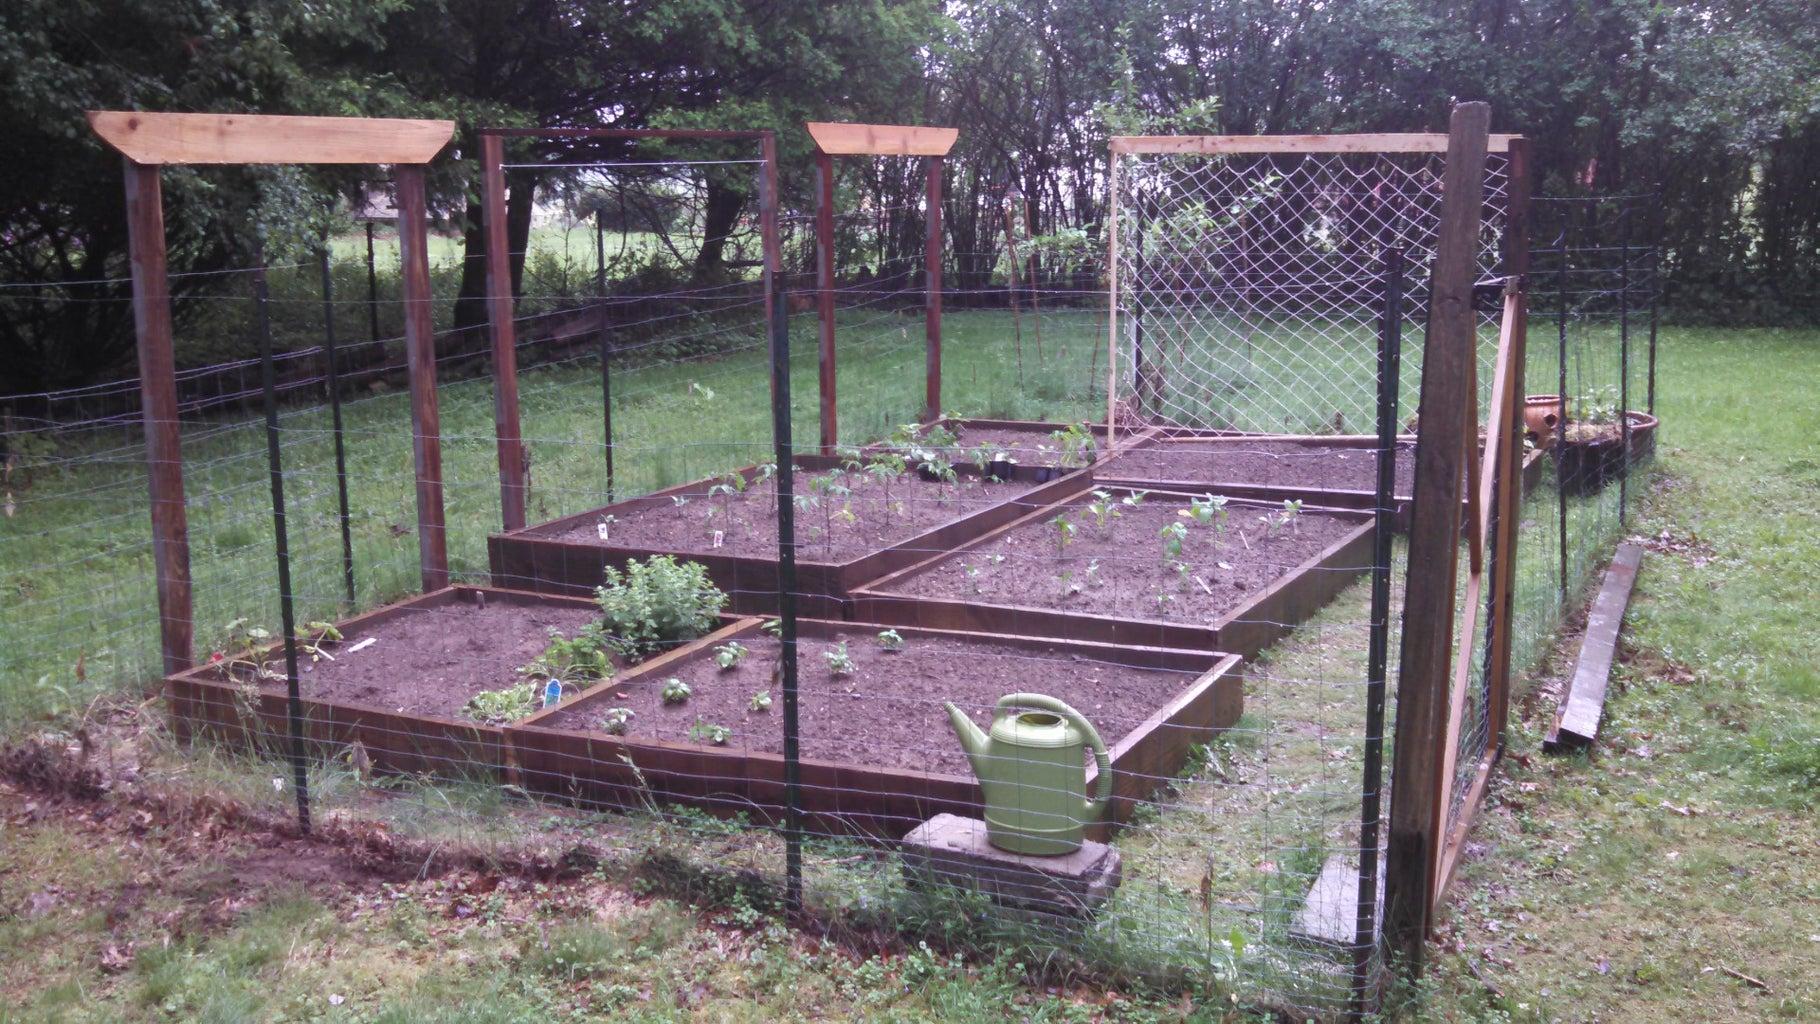 Vertical Gardening Trellis for Tomatos or Squash